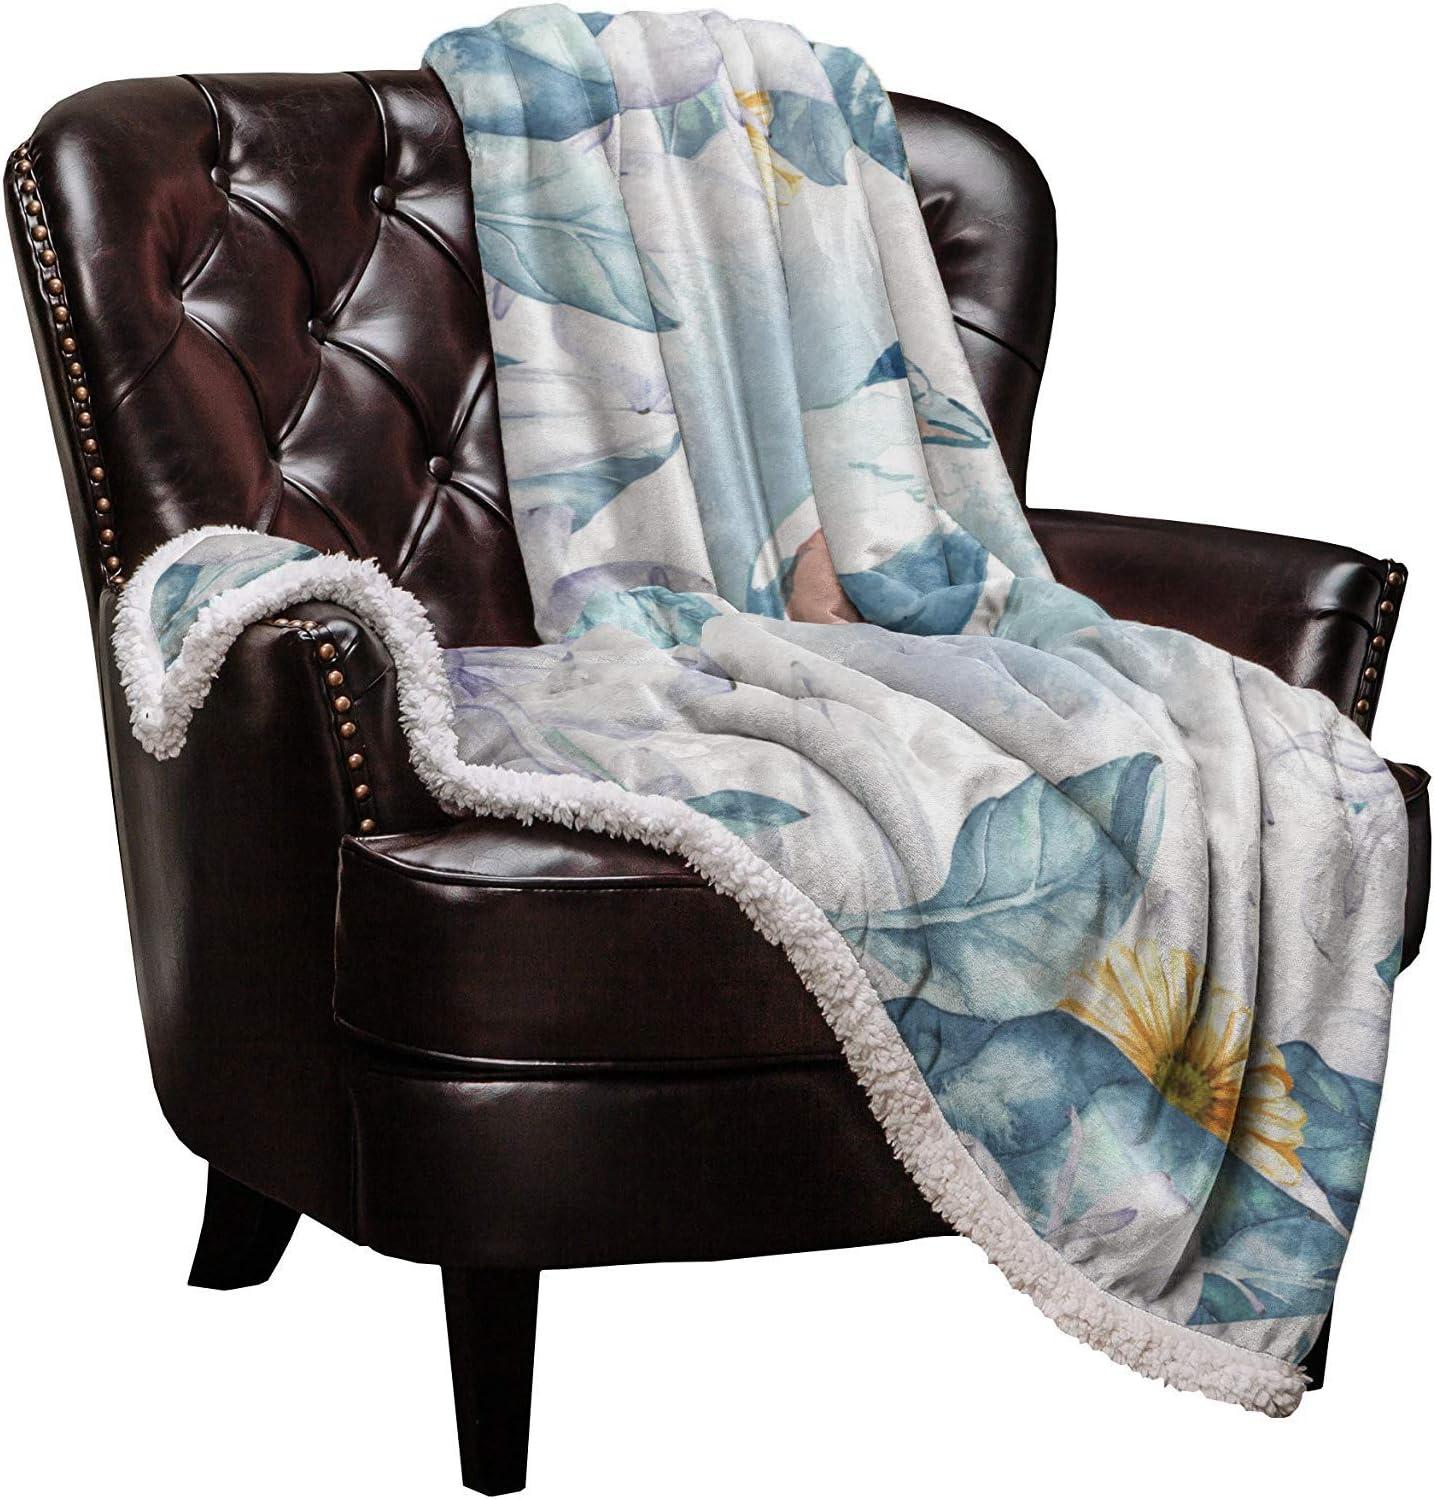 Sherpa Super-cheap Fleece Throw Blanket Floral Ranking TOP19 and Bird W Soft Blankets Warm